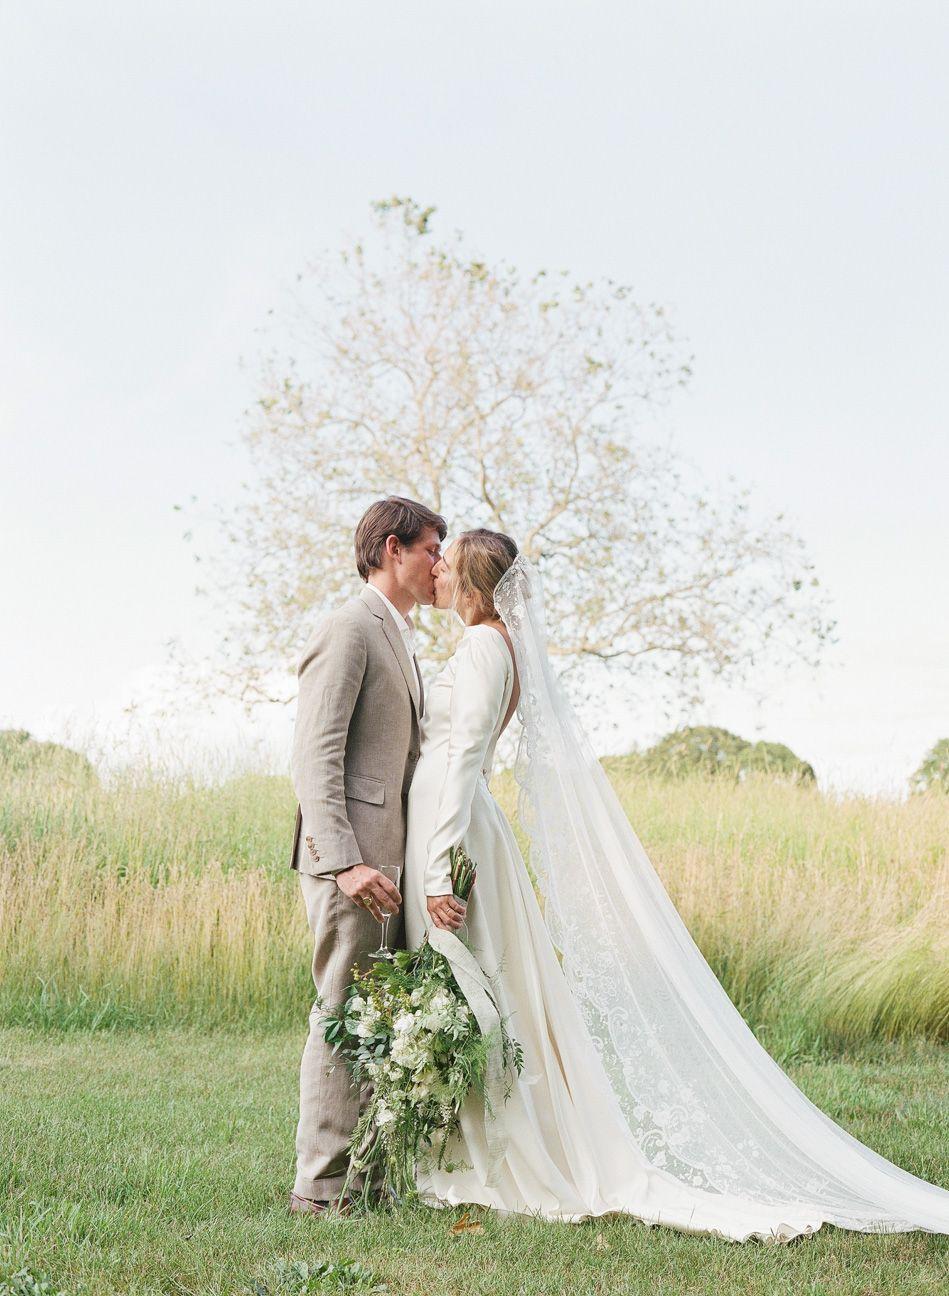 KareHillPhotography-Nassikas-Wedding-0744.jpg